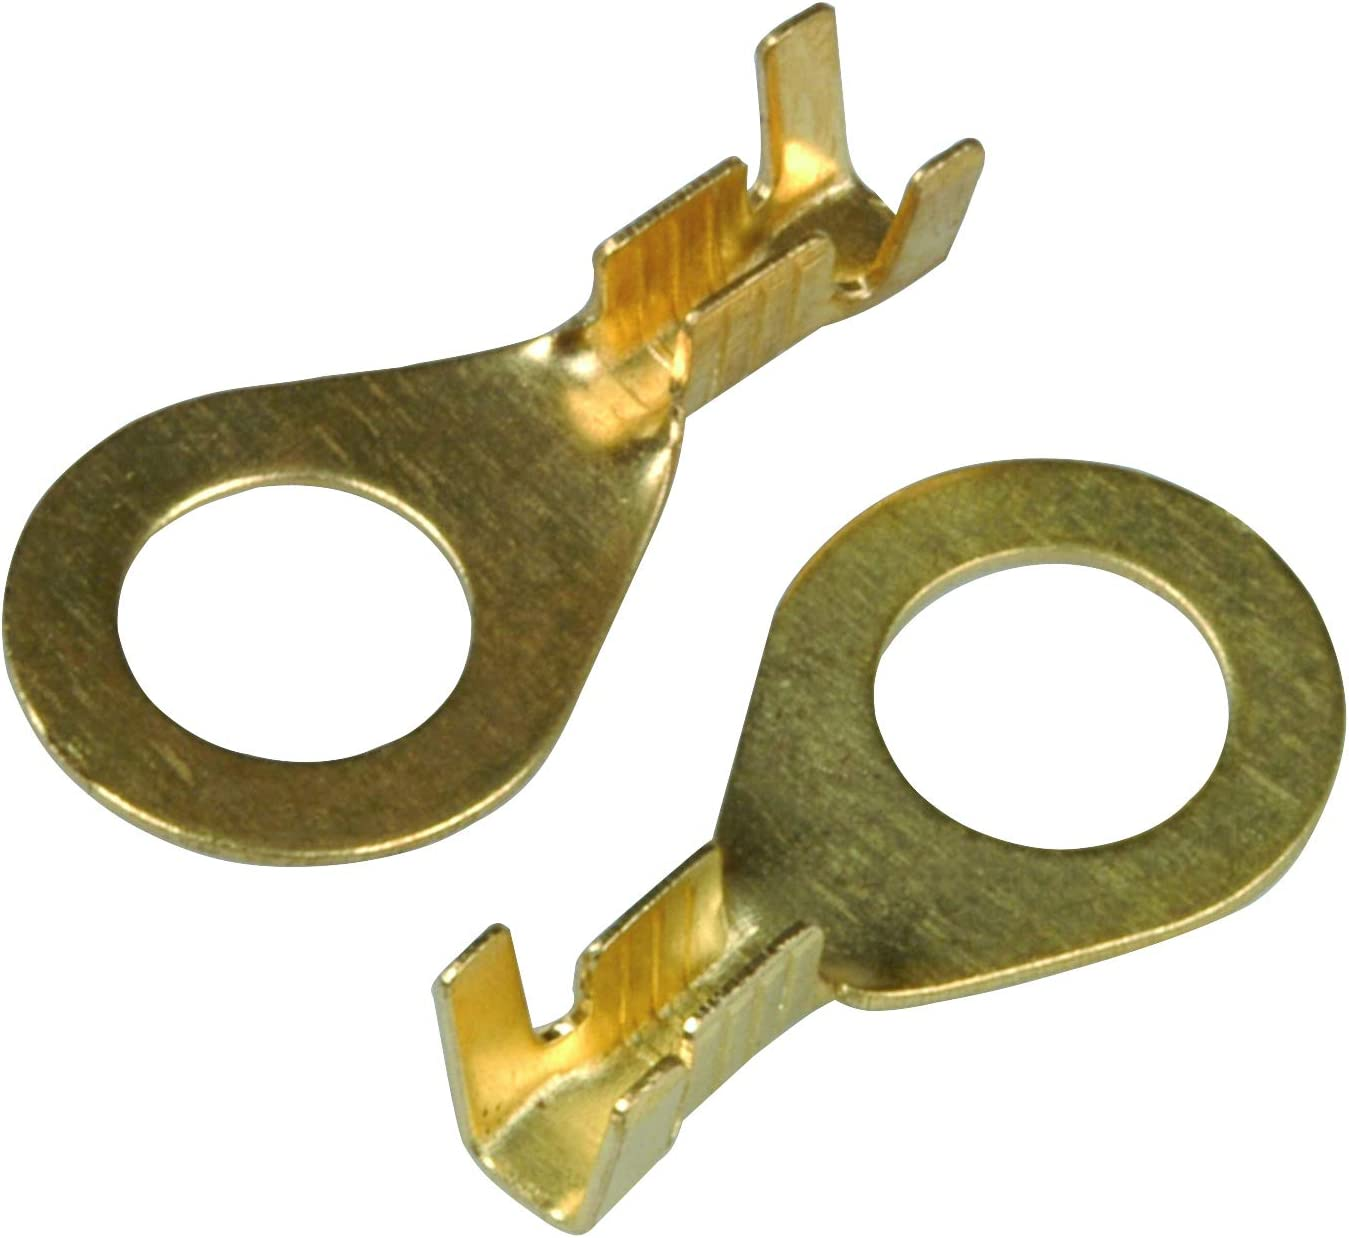 Kabelschuh Ring M8 Cartrend 10477 20 St/ück blank